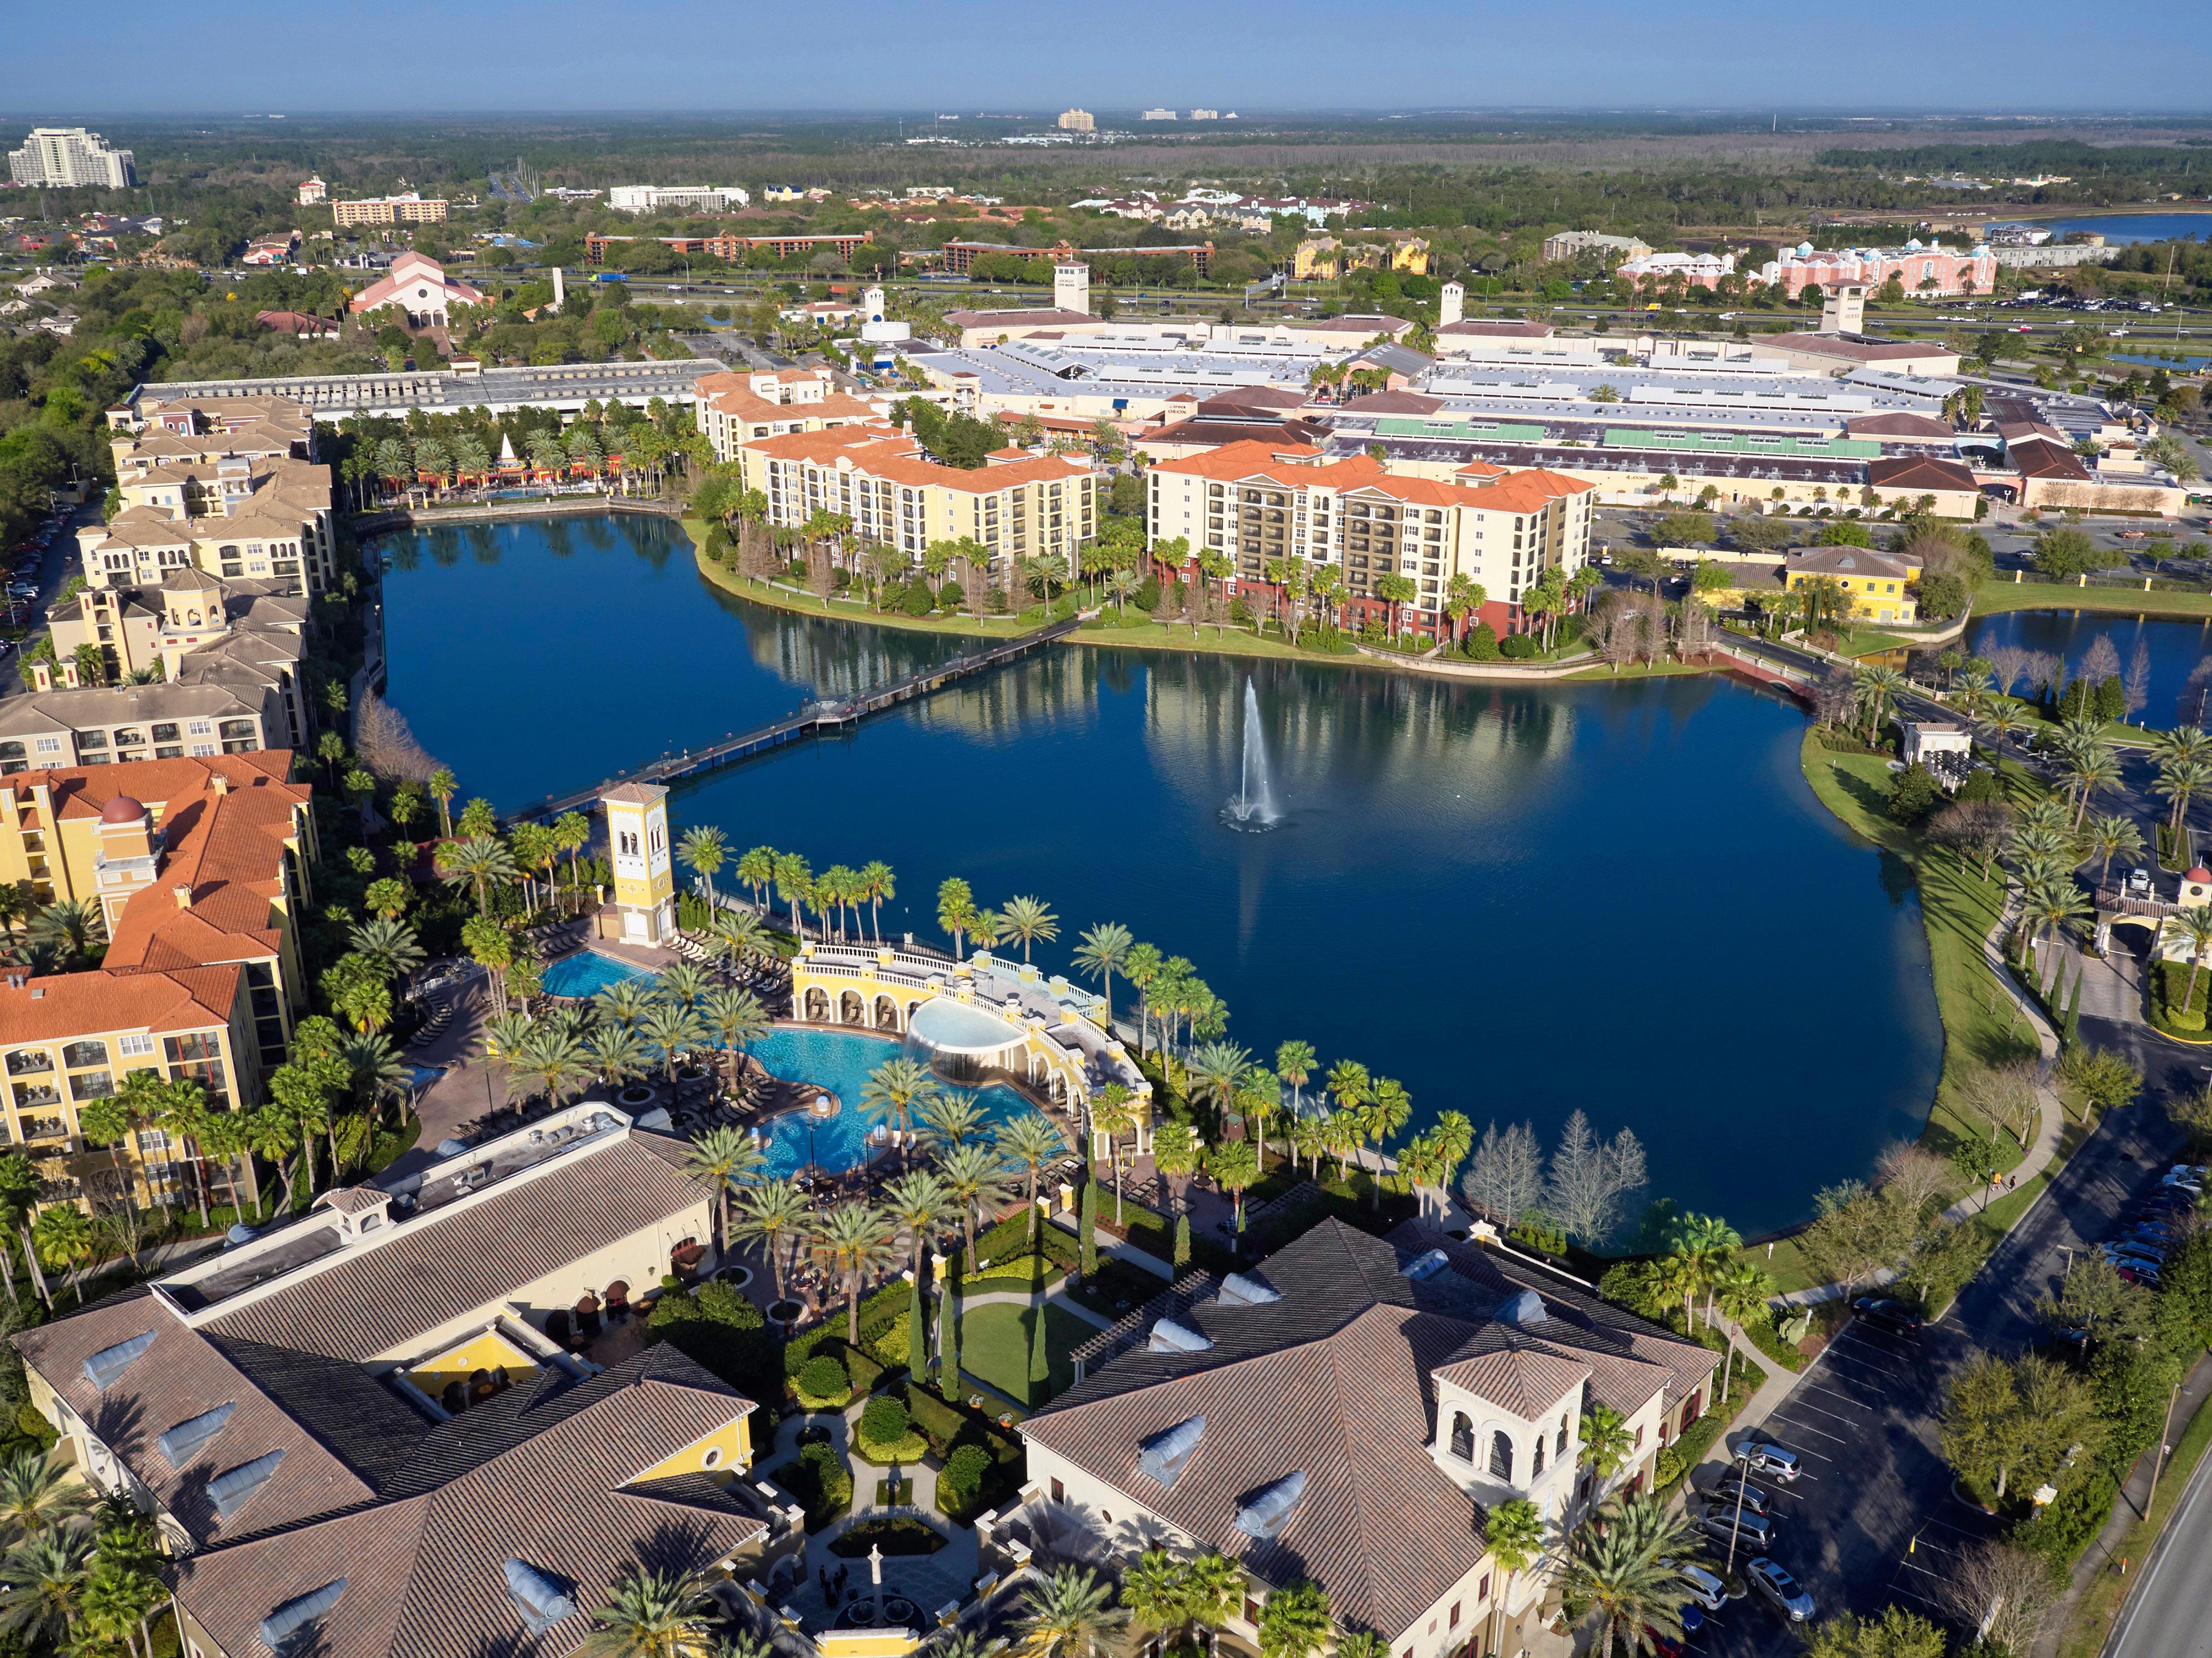 Hilton Grand Vacations at Tuscany Village  Orlando FL